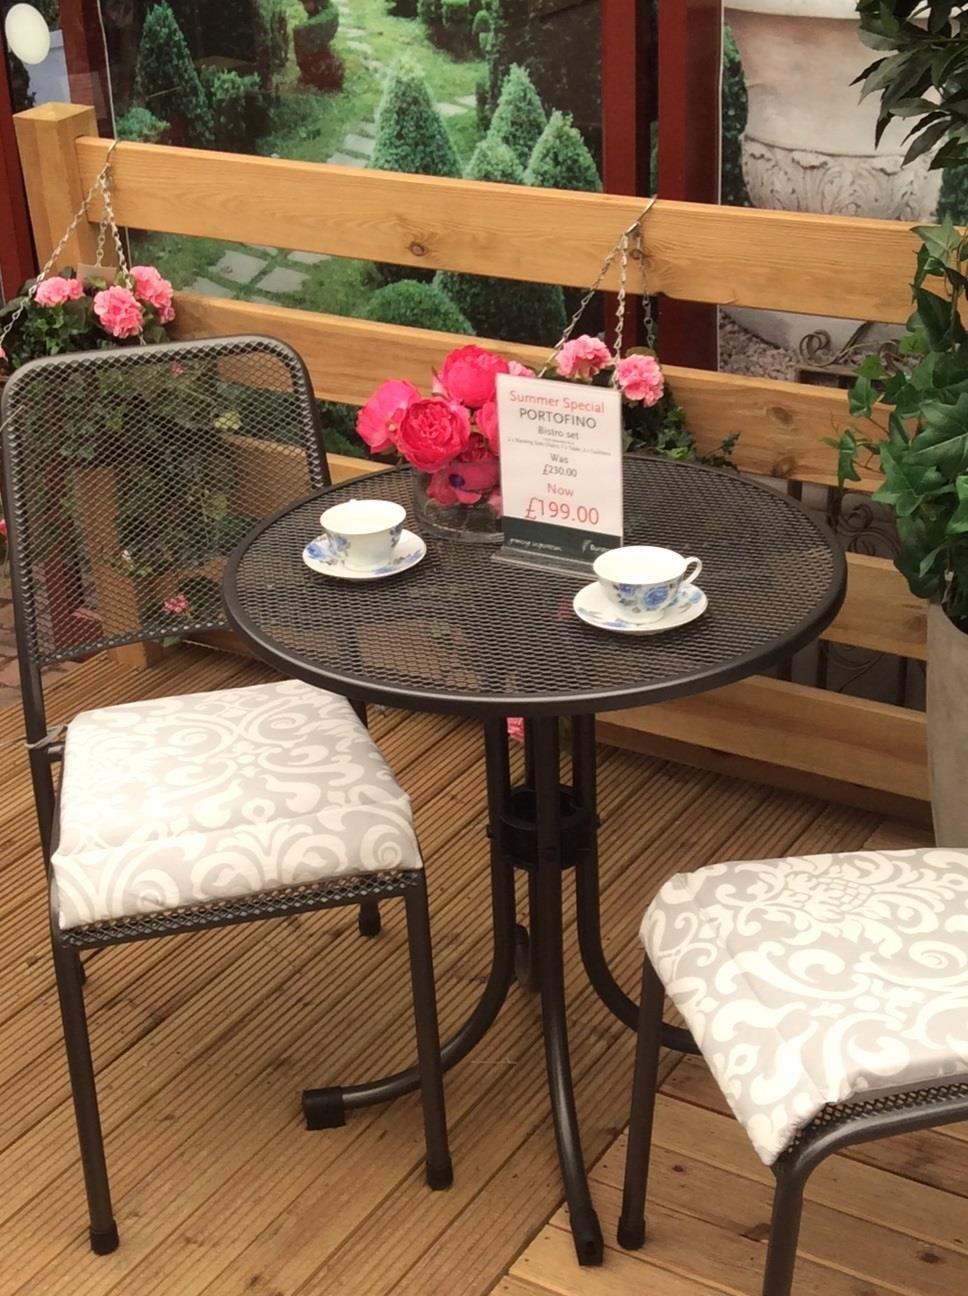 Smaller Portofino - Outdoor table and chairs - BBQ Sale at Burston Garden Centre